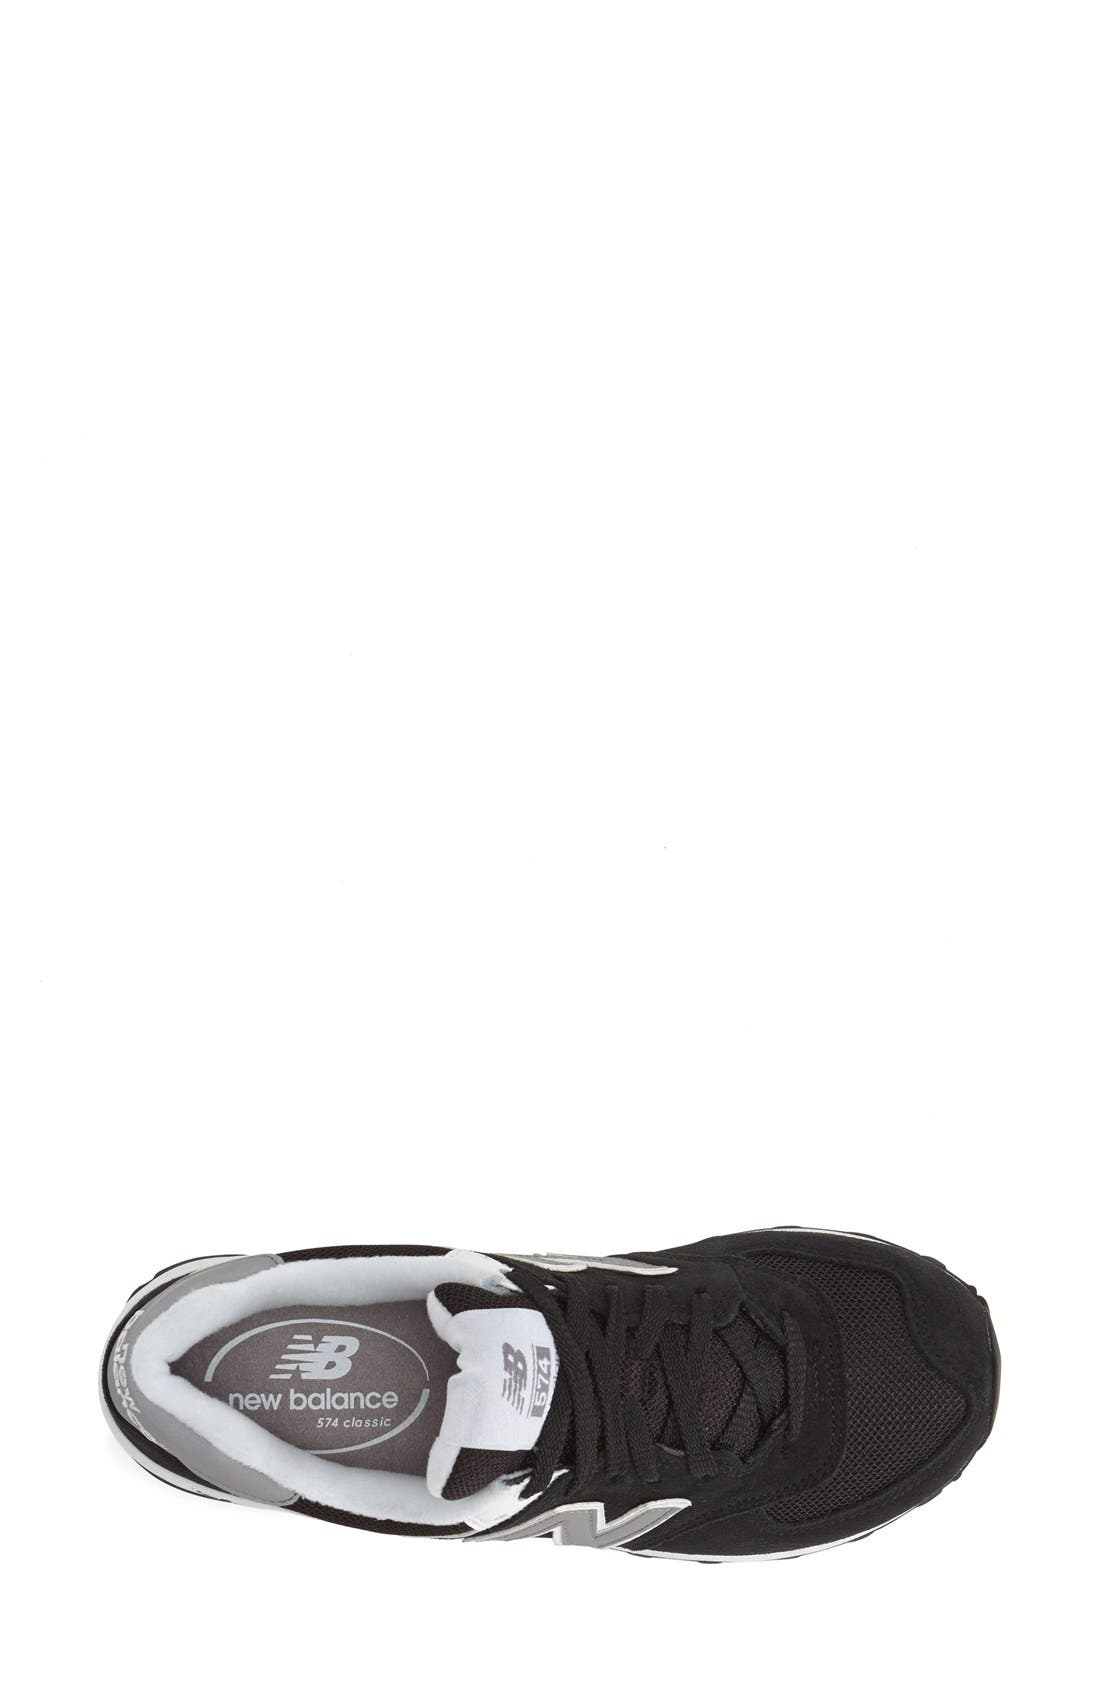 Alternate Image 3  - New Balance '574 Classic' Sneaker (Women)